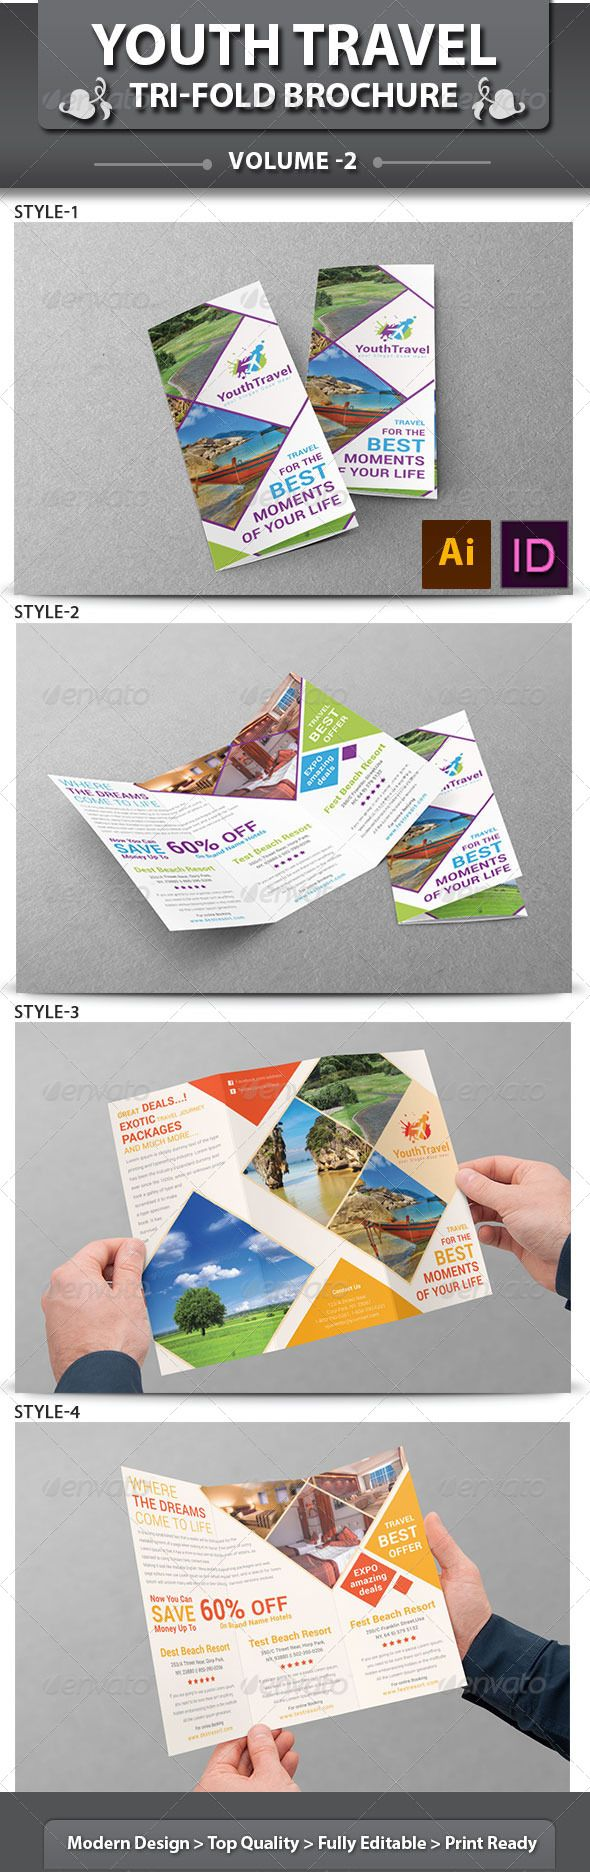 Travel Business Tri-fold Brochure   Volume 3  #GraphicRiver I love the diamond concept!